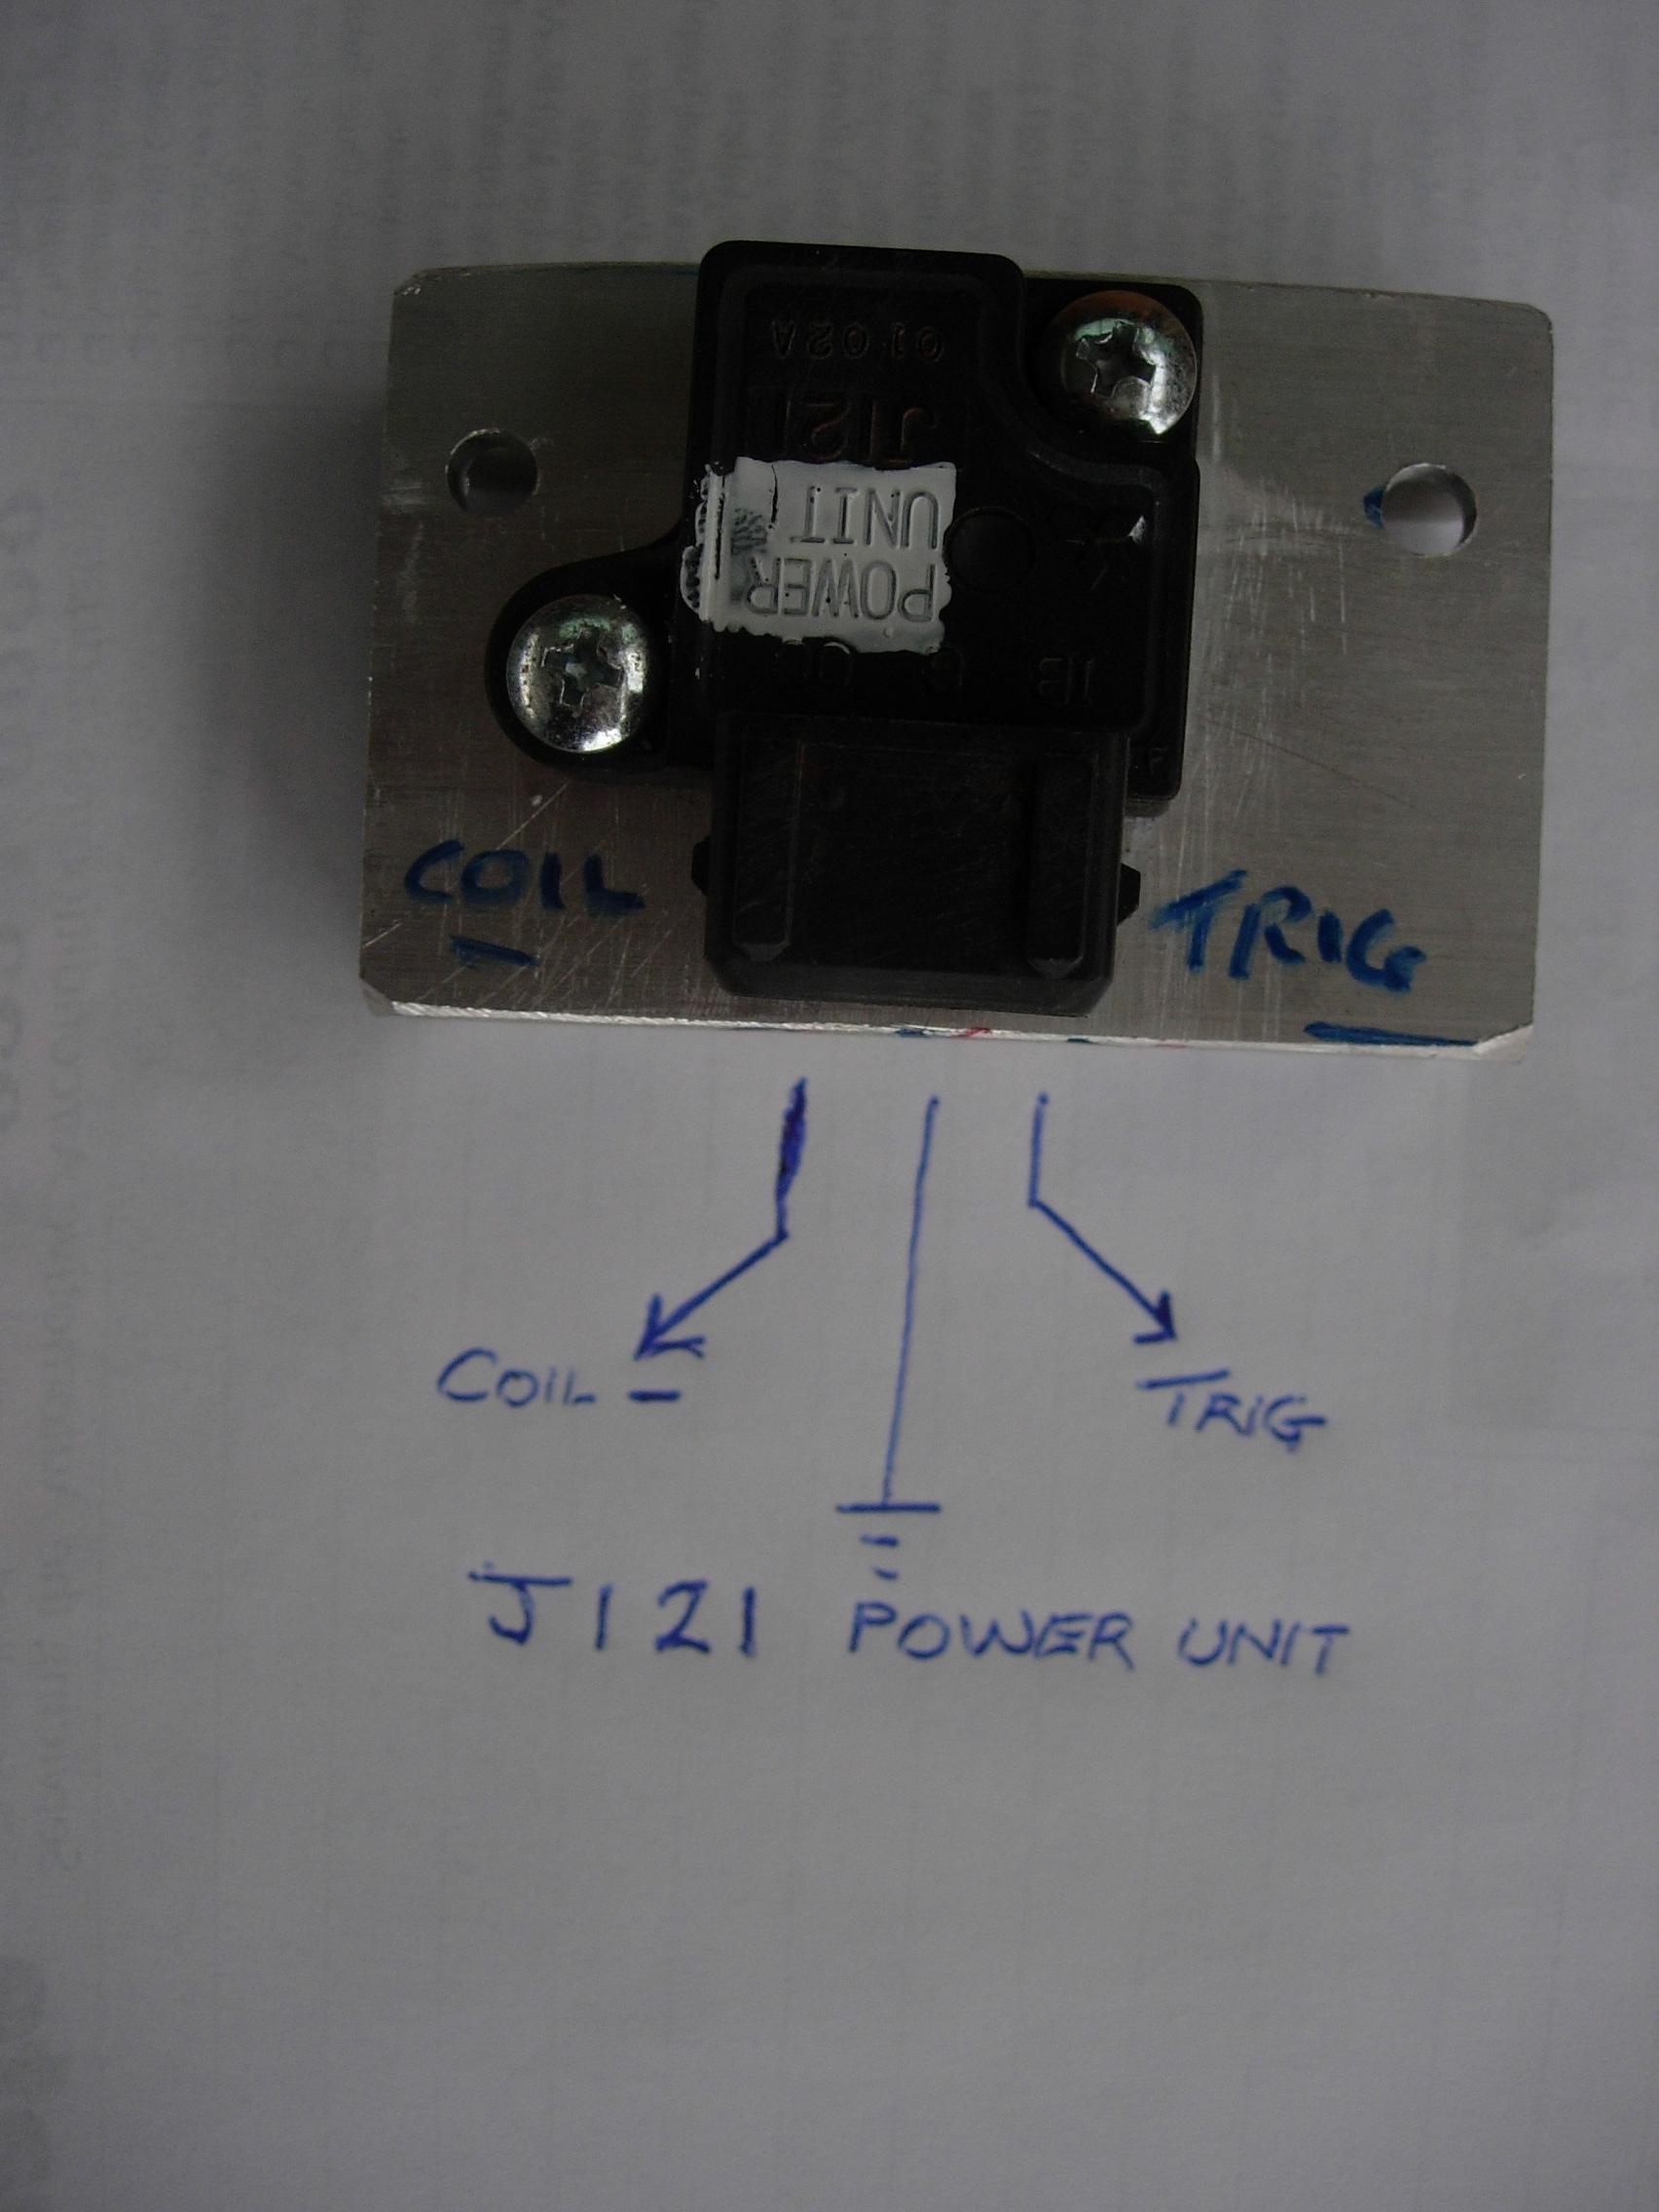 J121 IG MOD.1.JPG